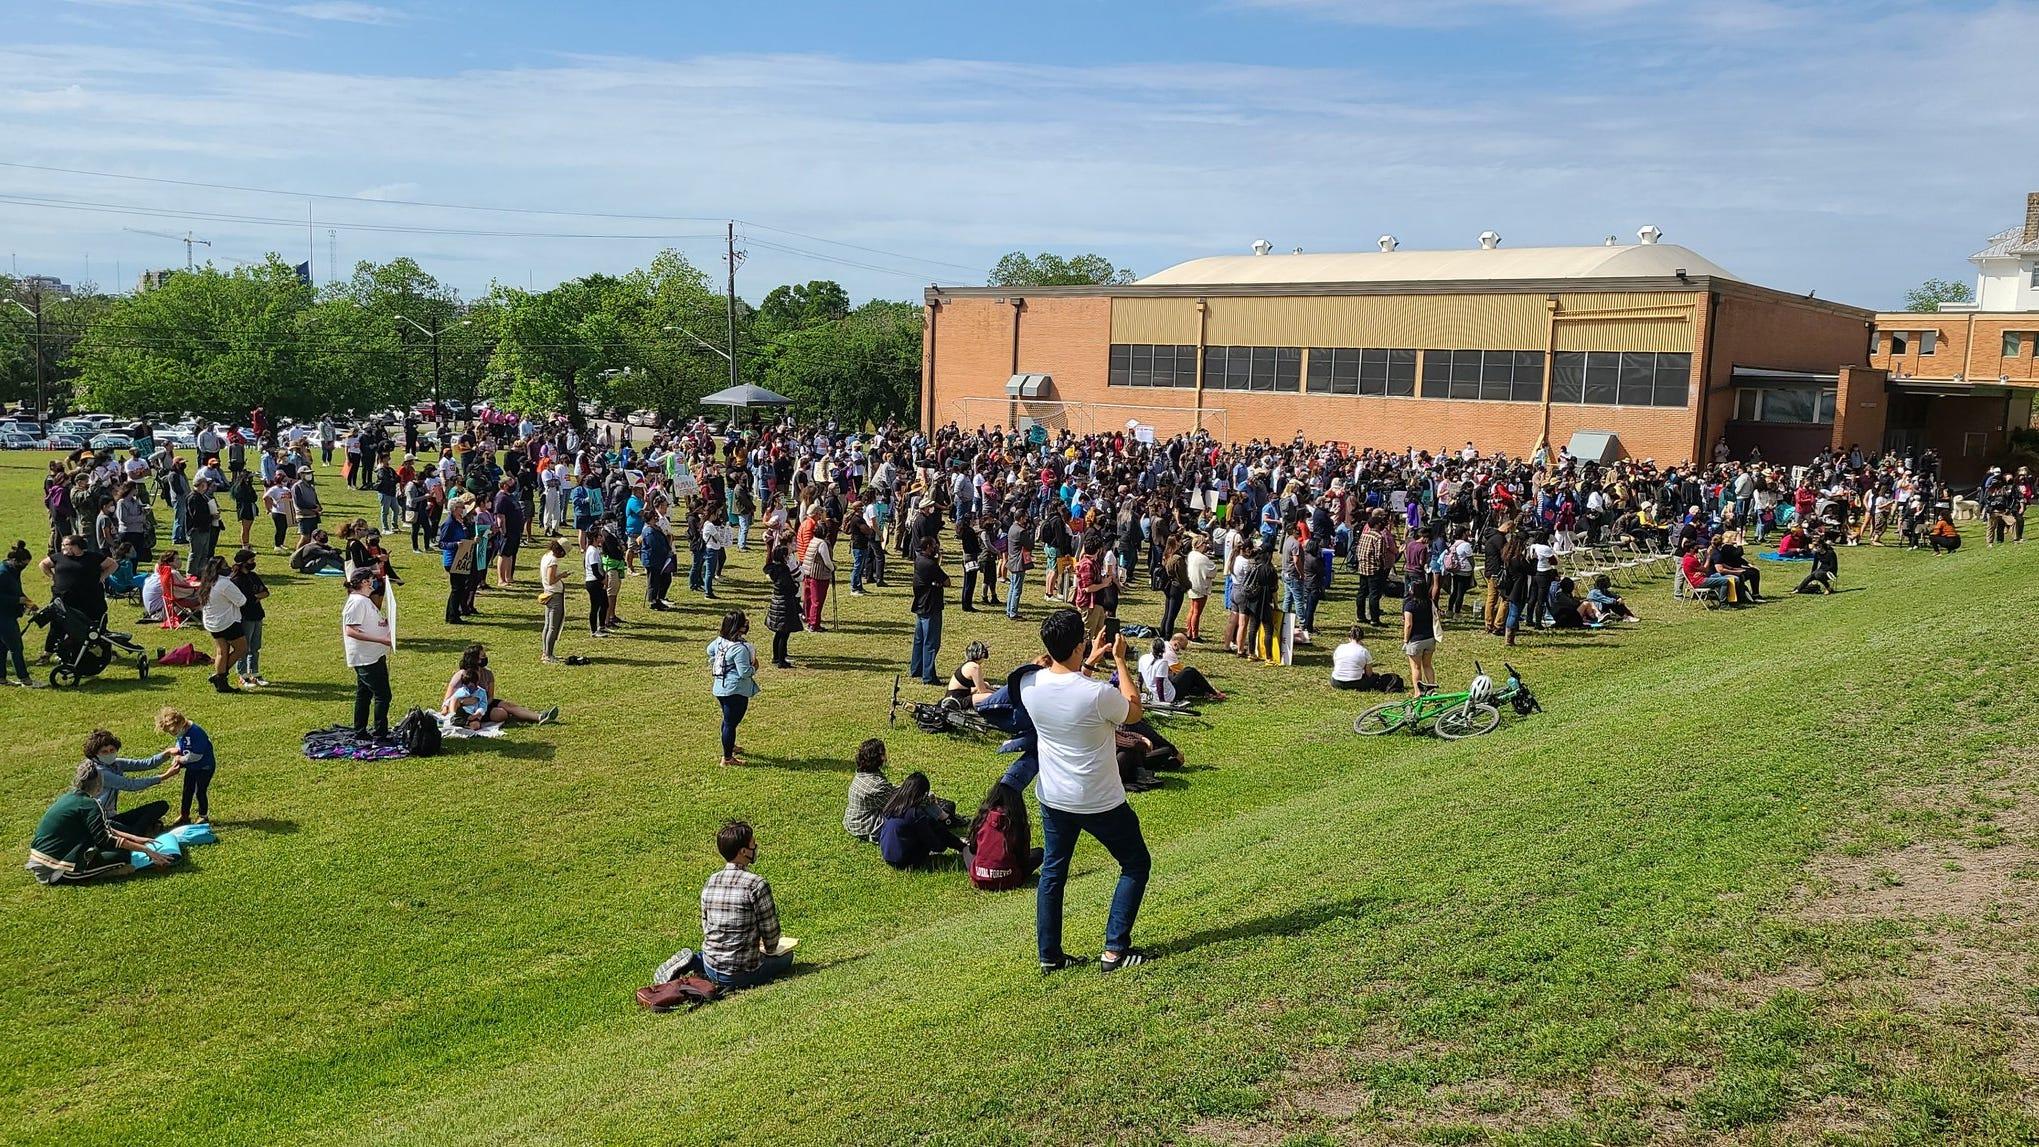 www.statesman.com: Hundreds rally against anti-Asian hate at Huston-Tillotson